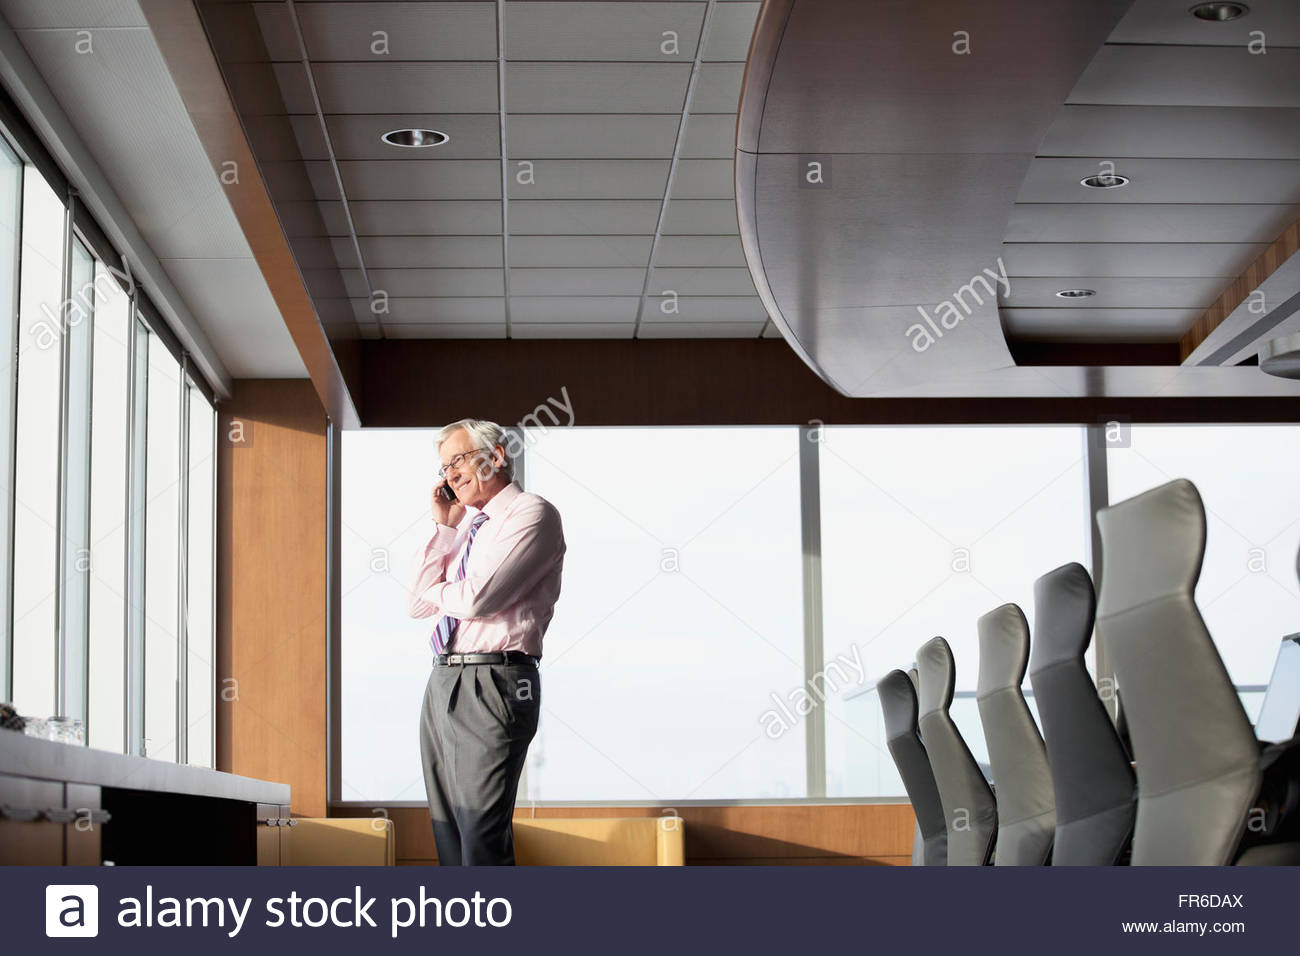 senior business man on phone call - Stock Image